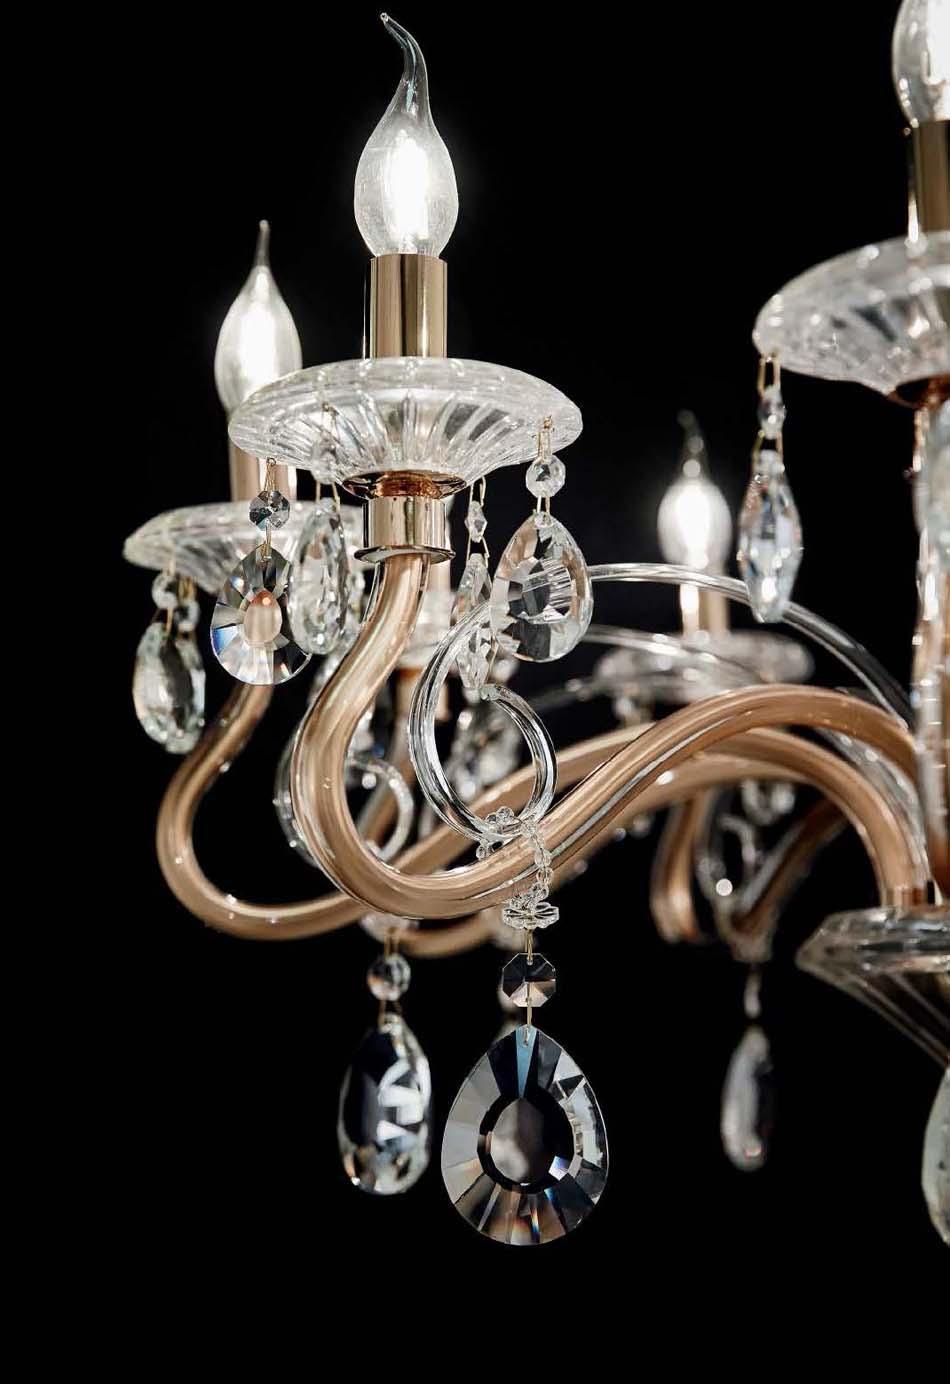 Lampade 32 sospese vintage Ideal Lux Negresco – Toscana Arredamenti